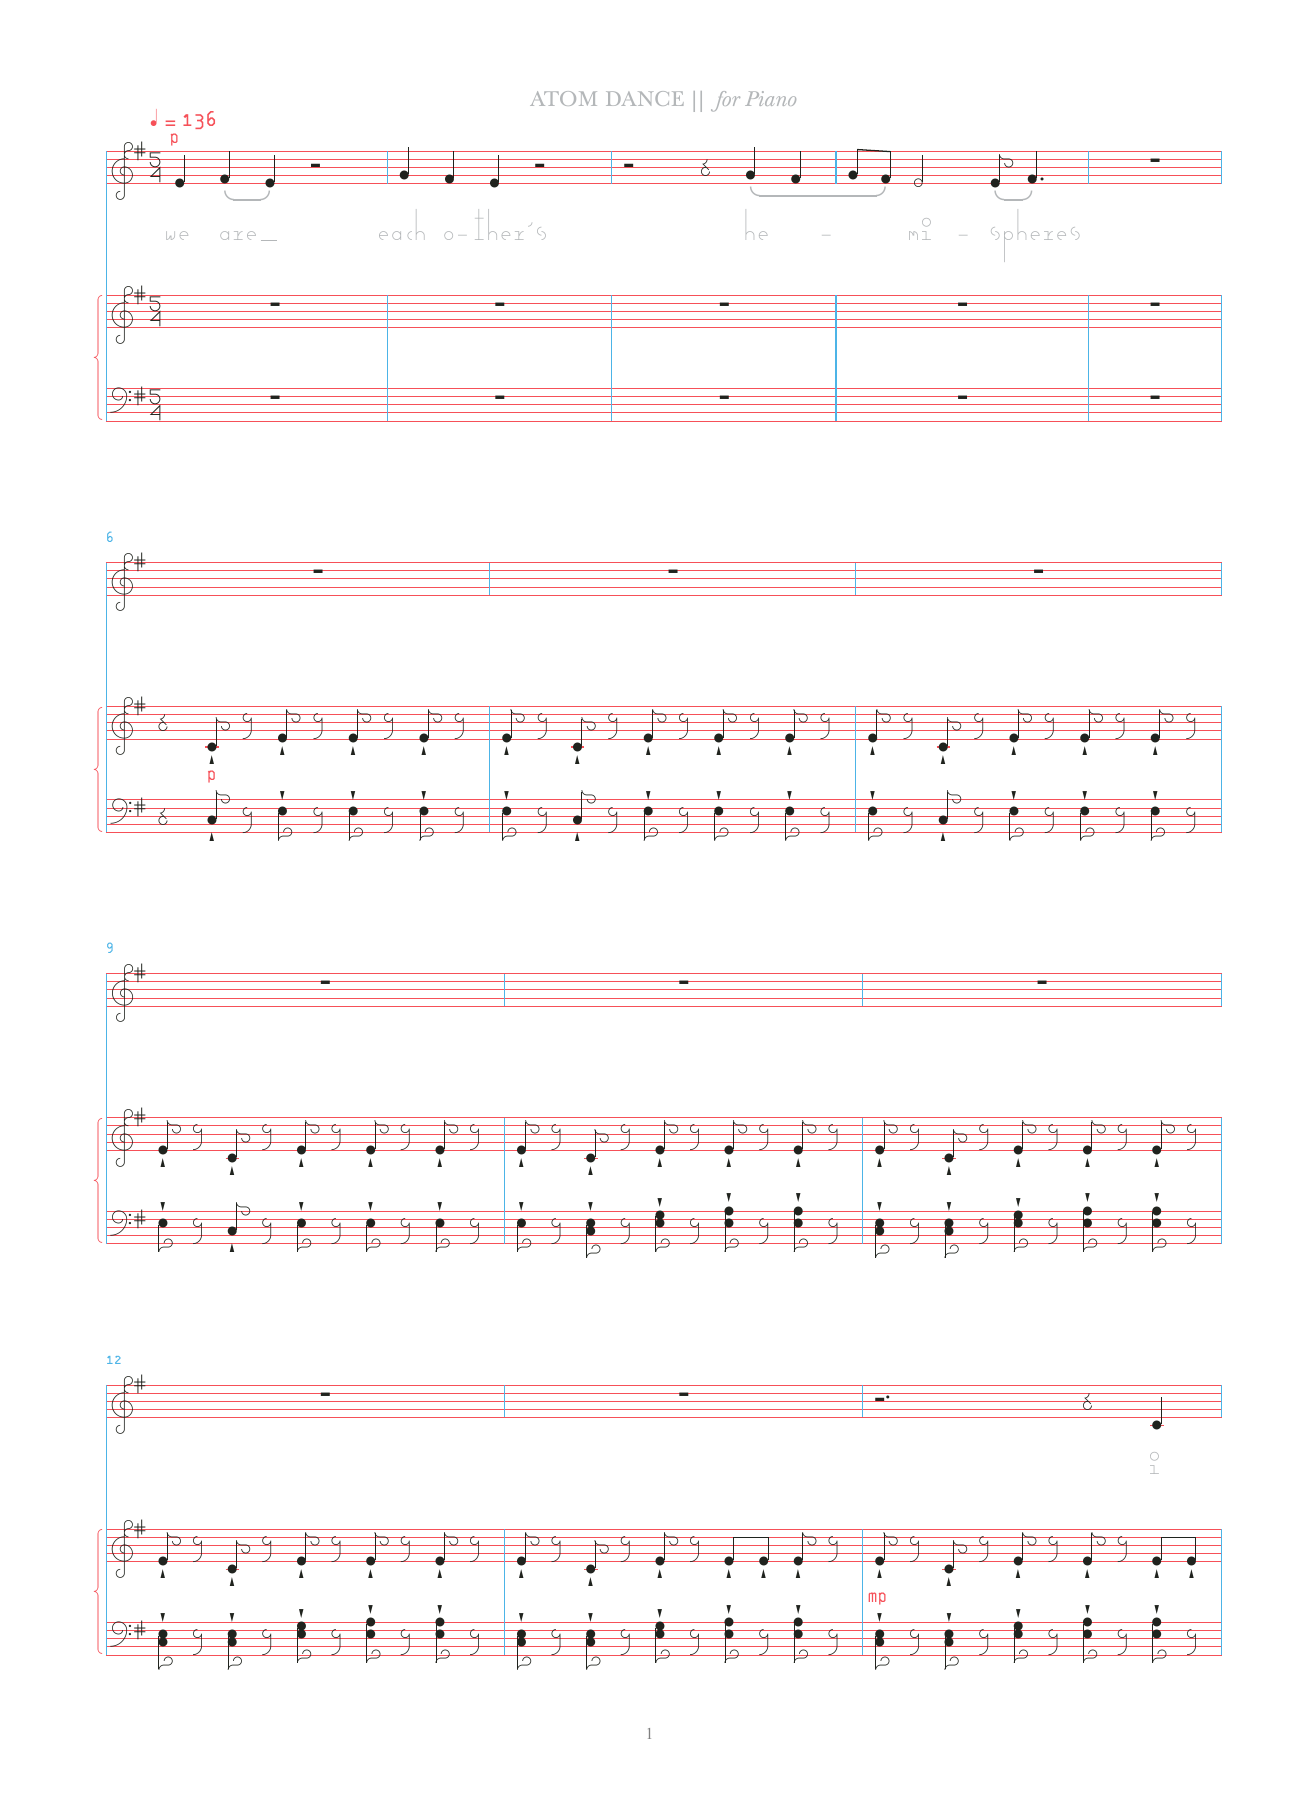 Atom Dance Sheet Music